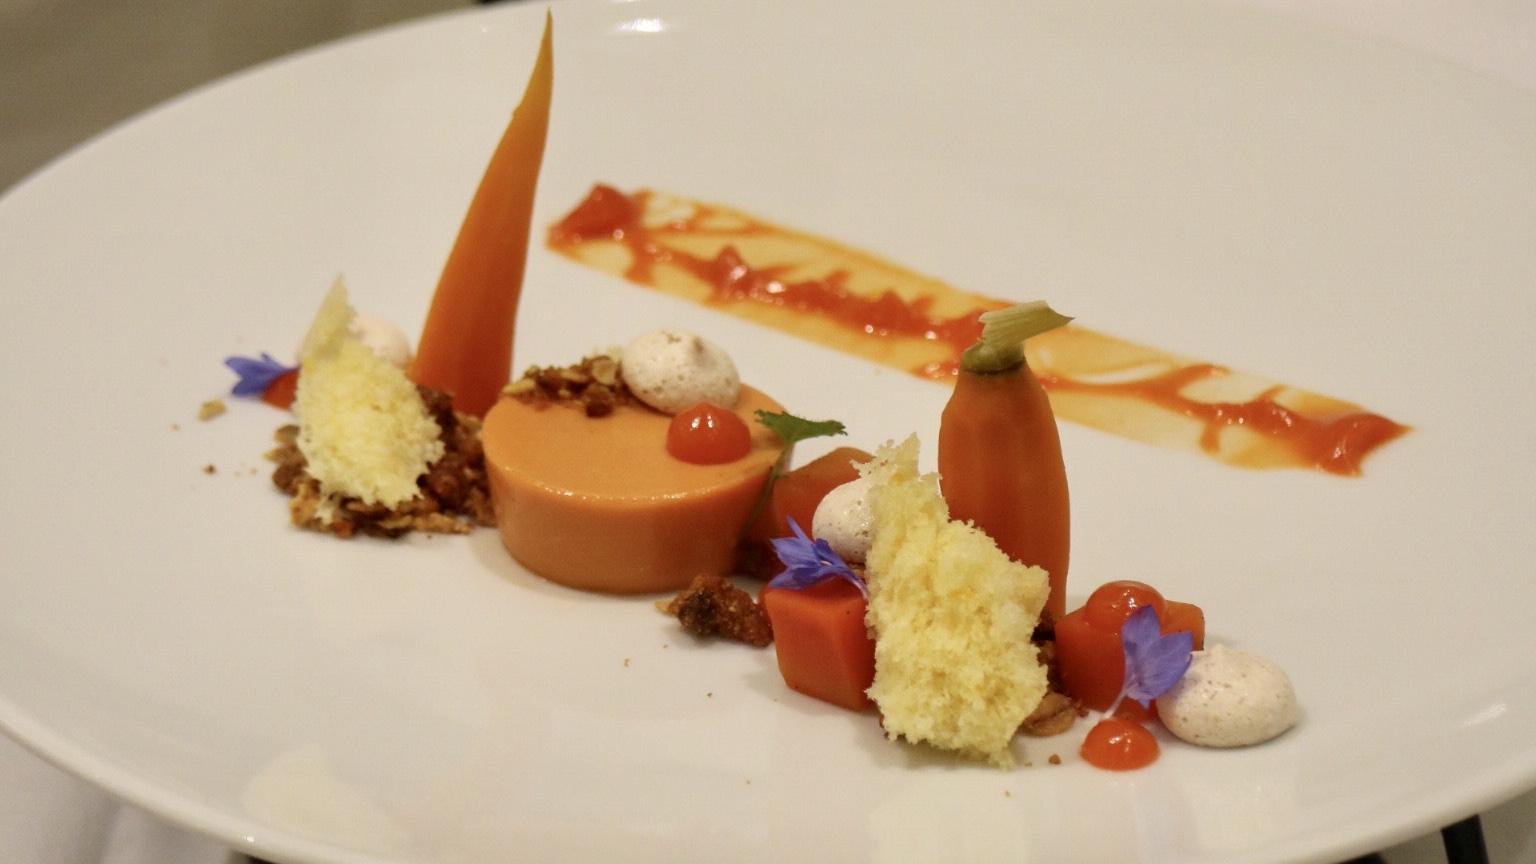 Textures of Carrots